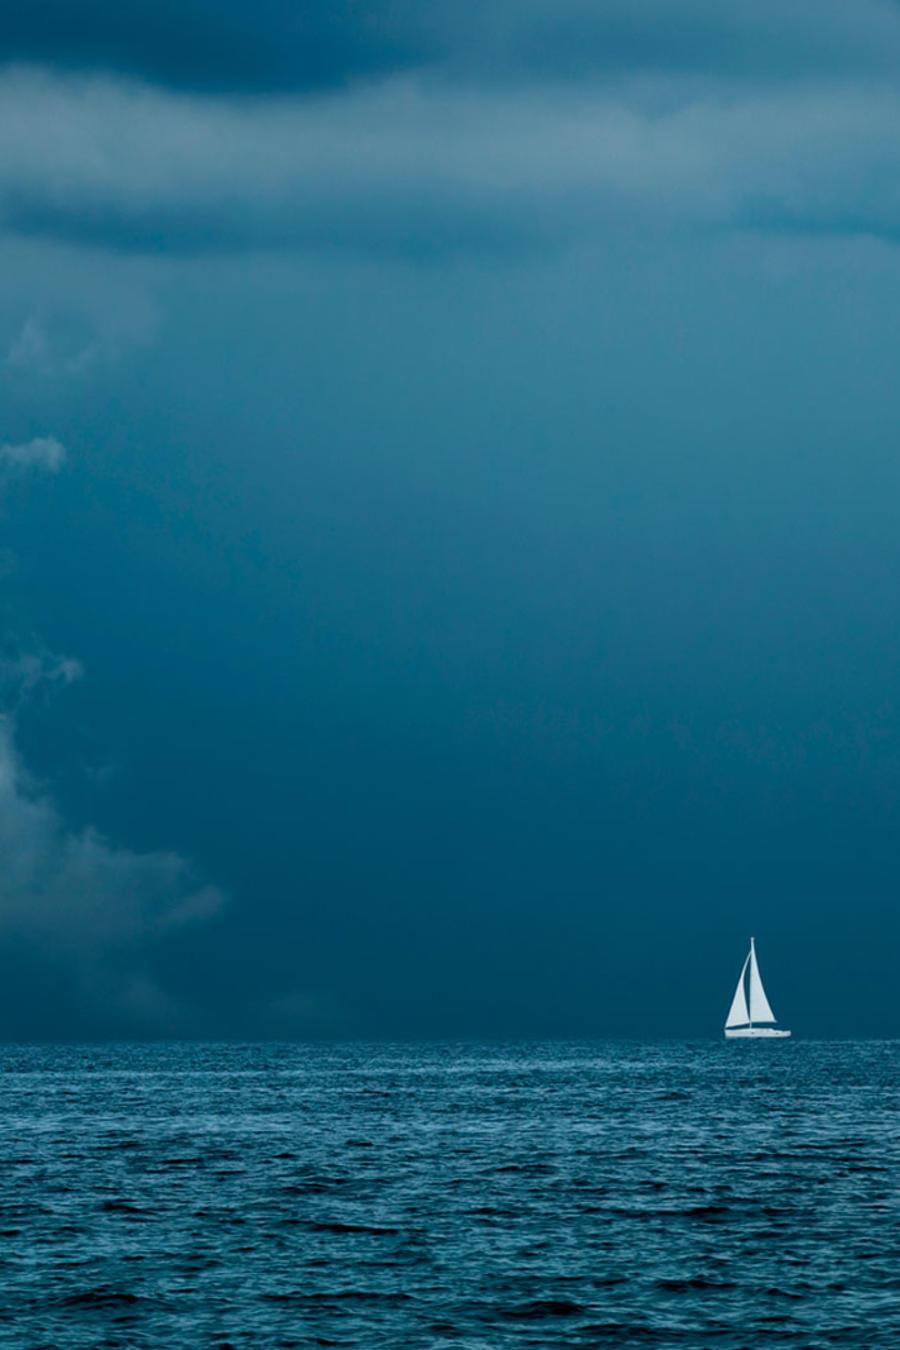 Velero navegando en un clima de tormenta